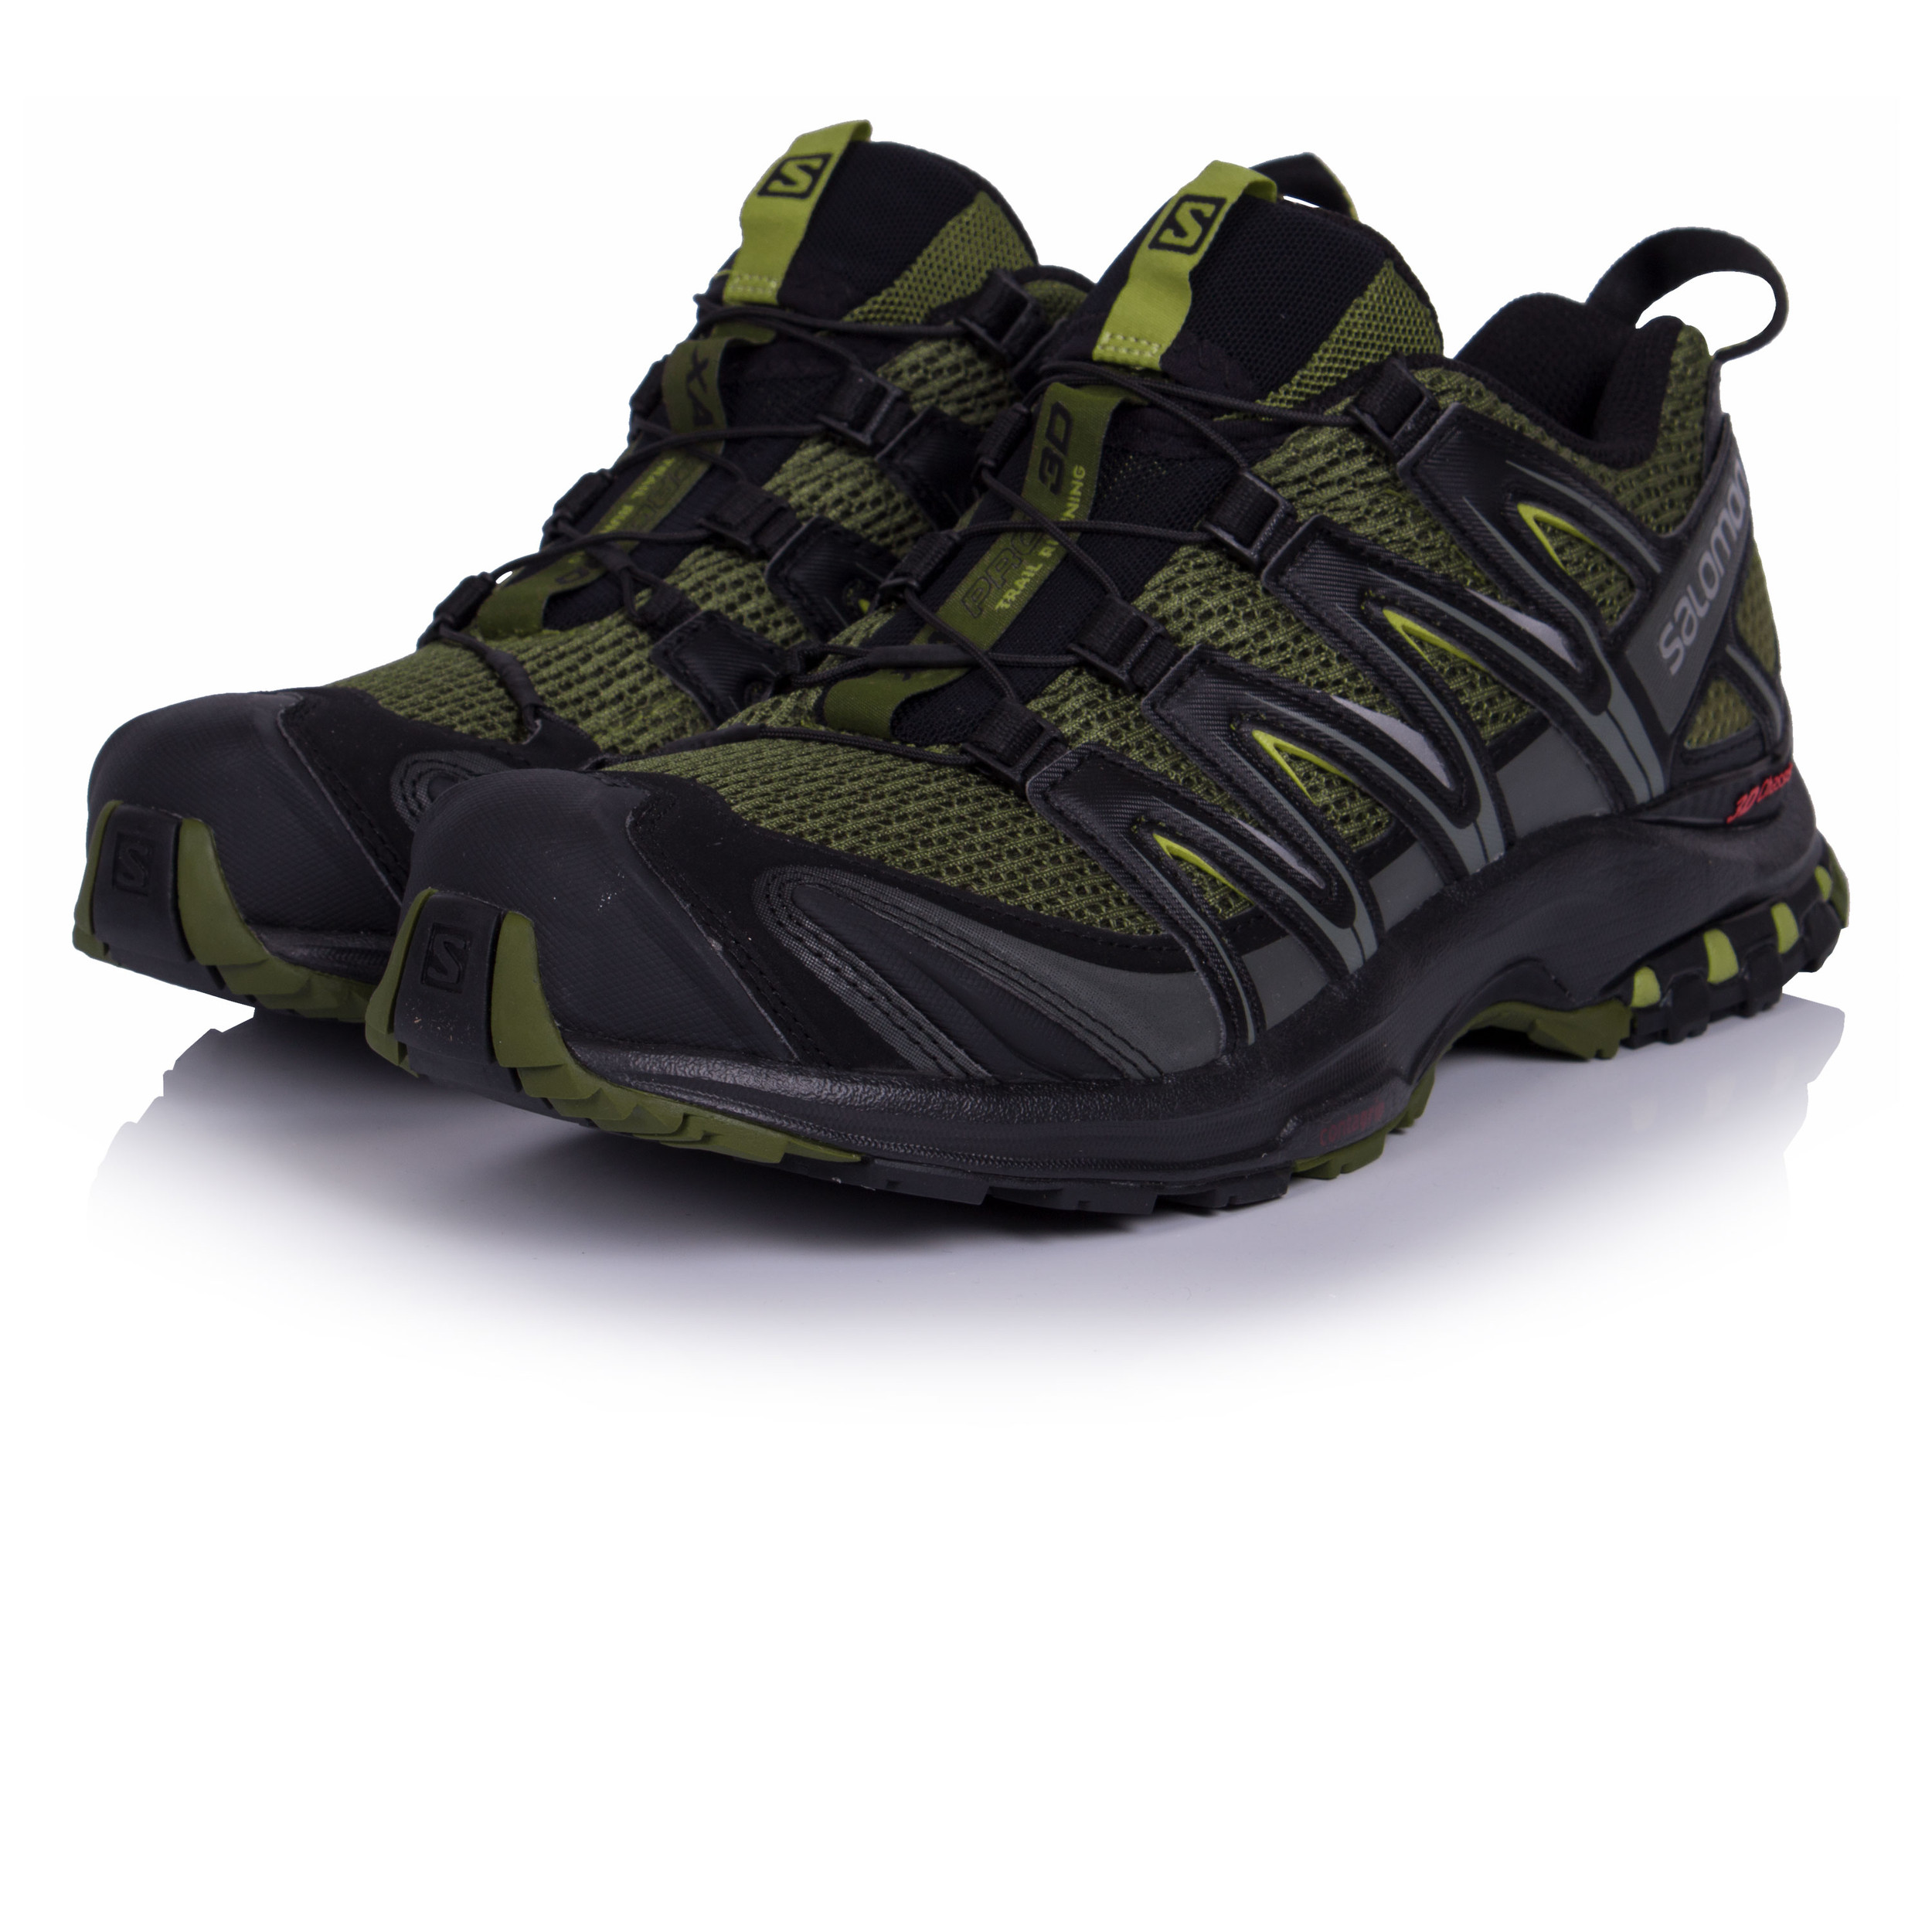 Xa Vert Chaussure Noir Camping Salomon De 3d Homme Trail Marche Pro 8NwvmOn0